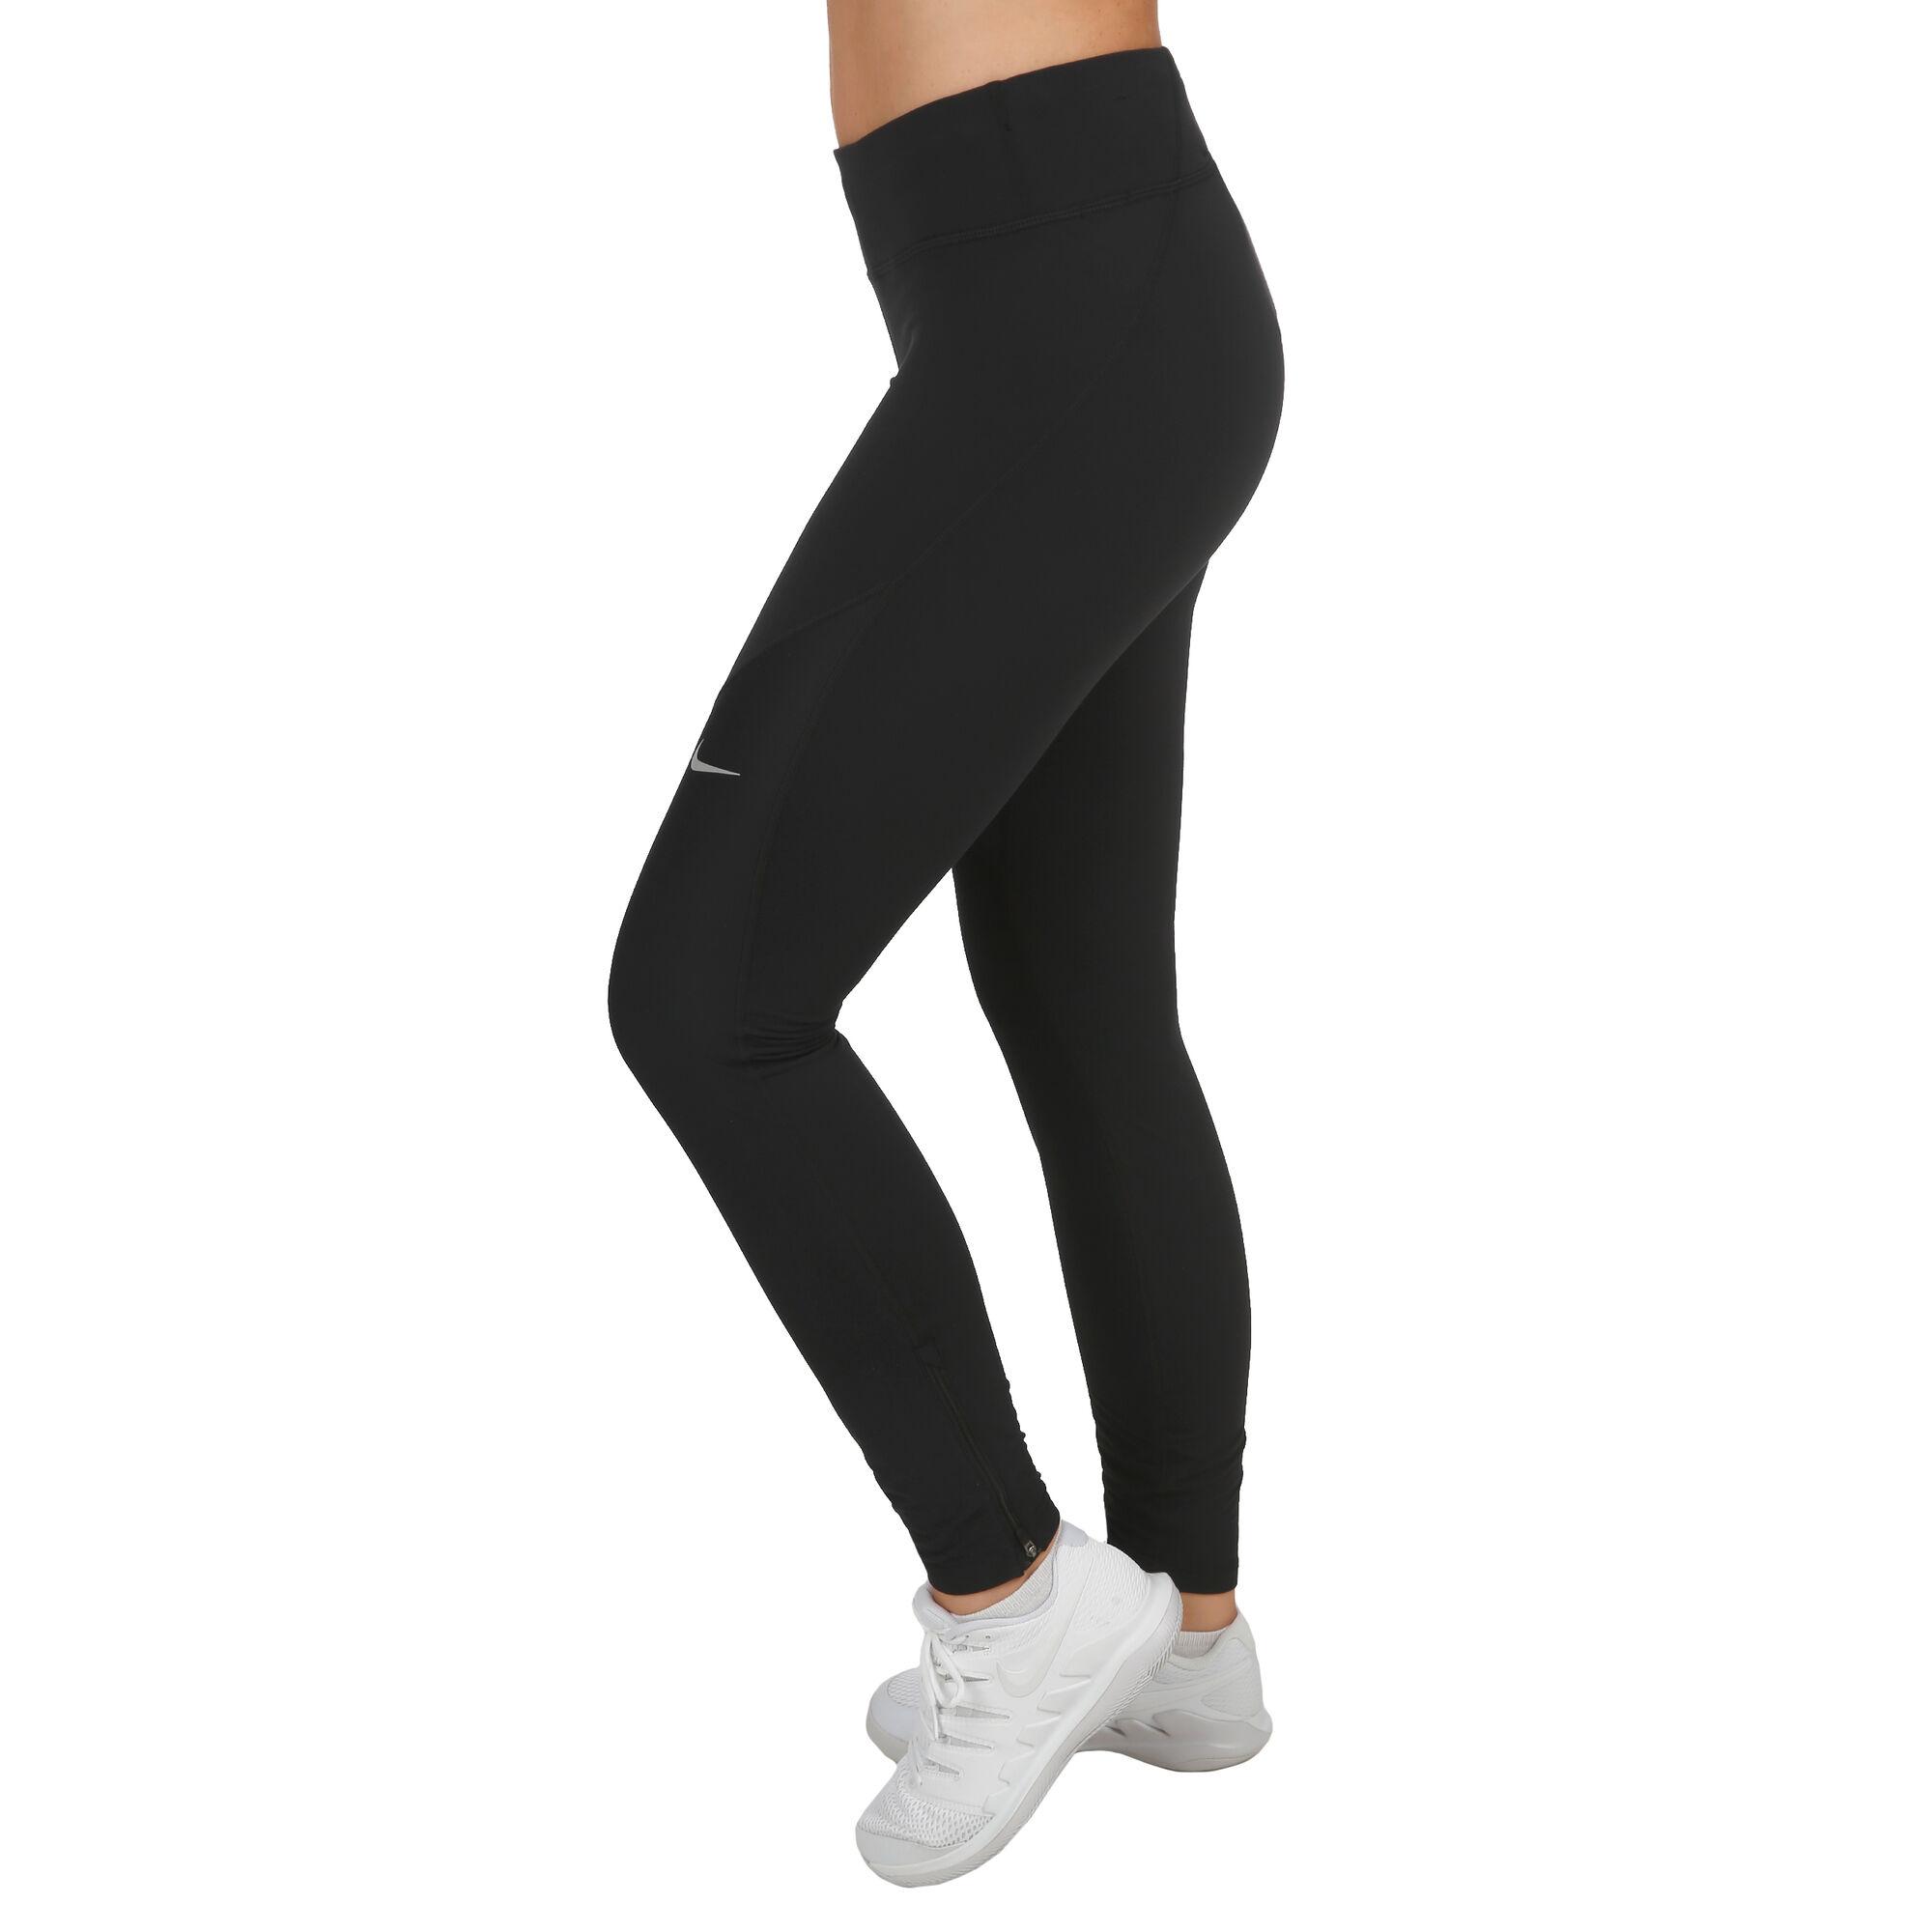 3cec1b5442f6 ... Nike · Nike · Nike · Nike · Nike · Nike. Epic Lux Shield Running Tight  Women ...